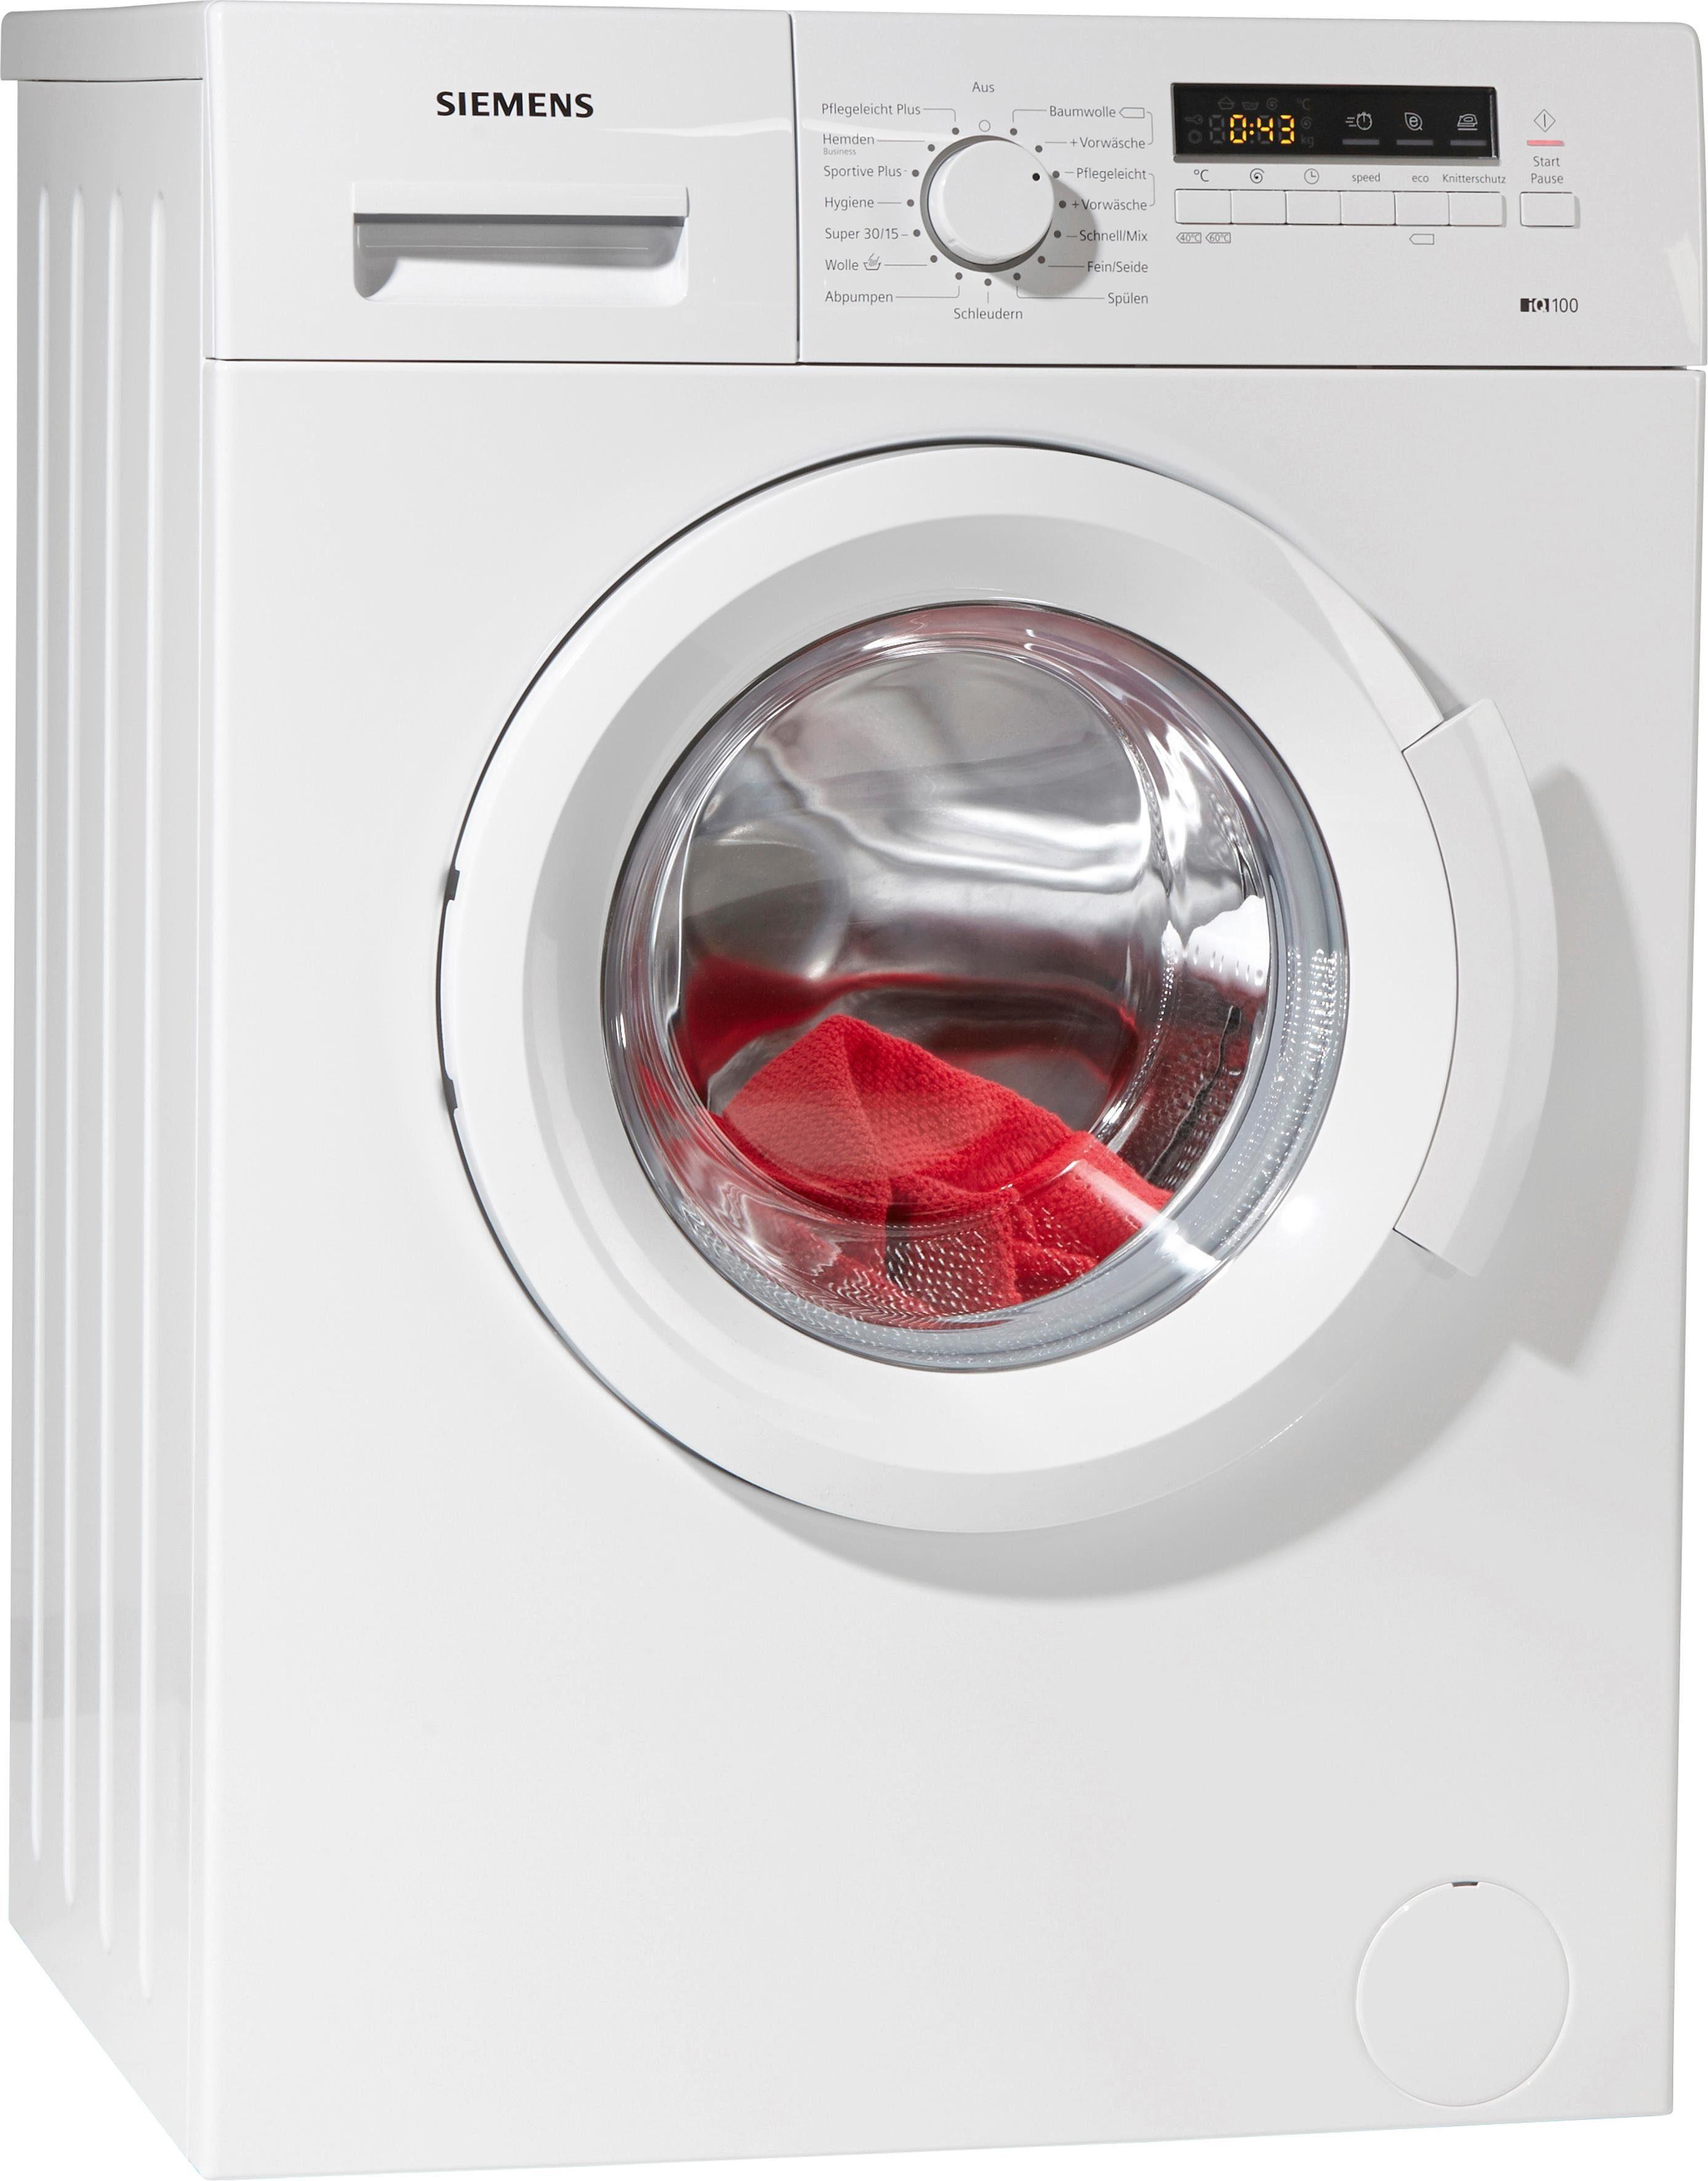 SIEMENS Waschmaschine WM14B2ECO, A+++, 6 kg, 1400 U/Min